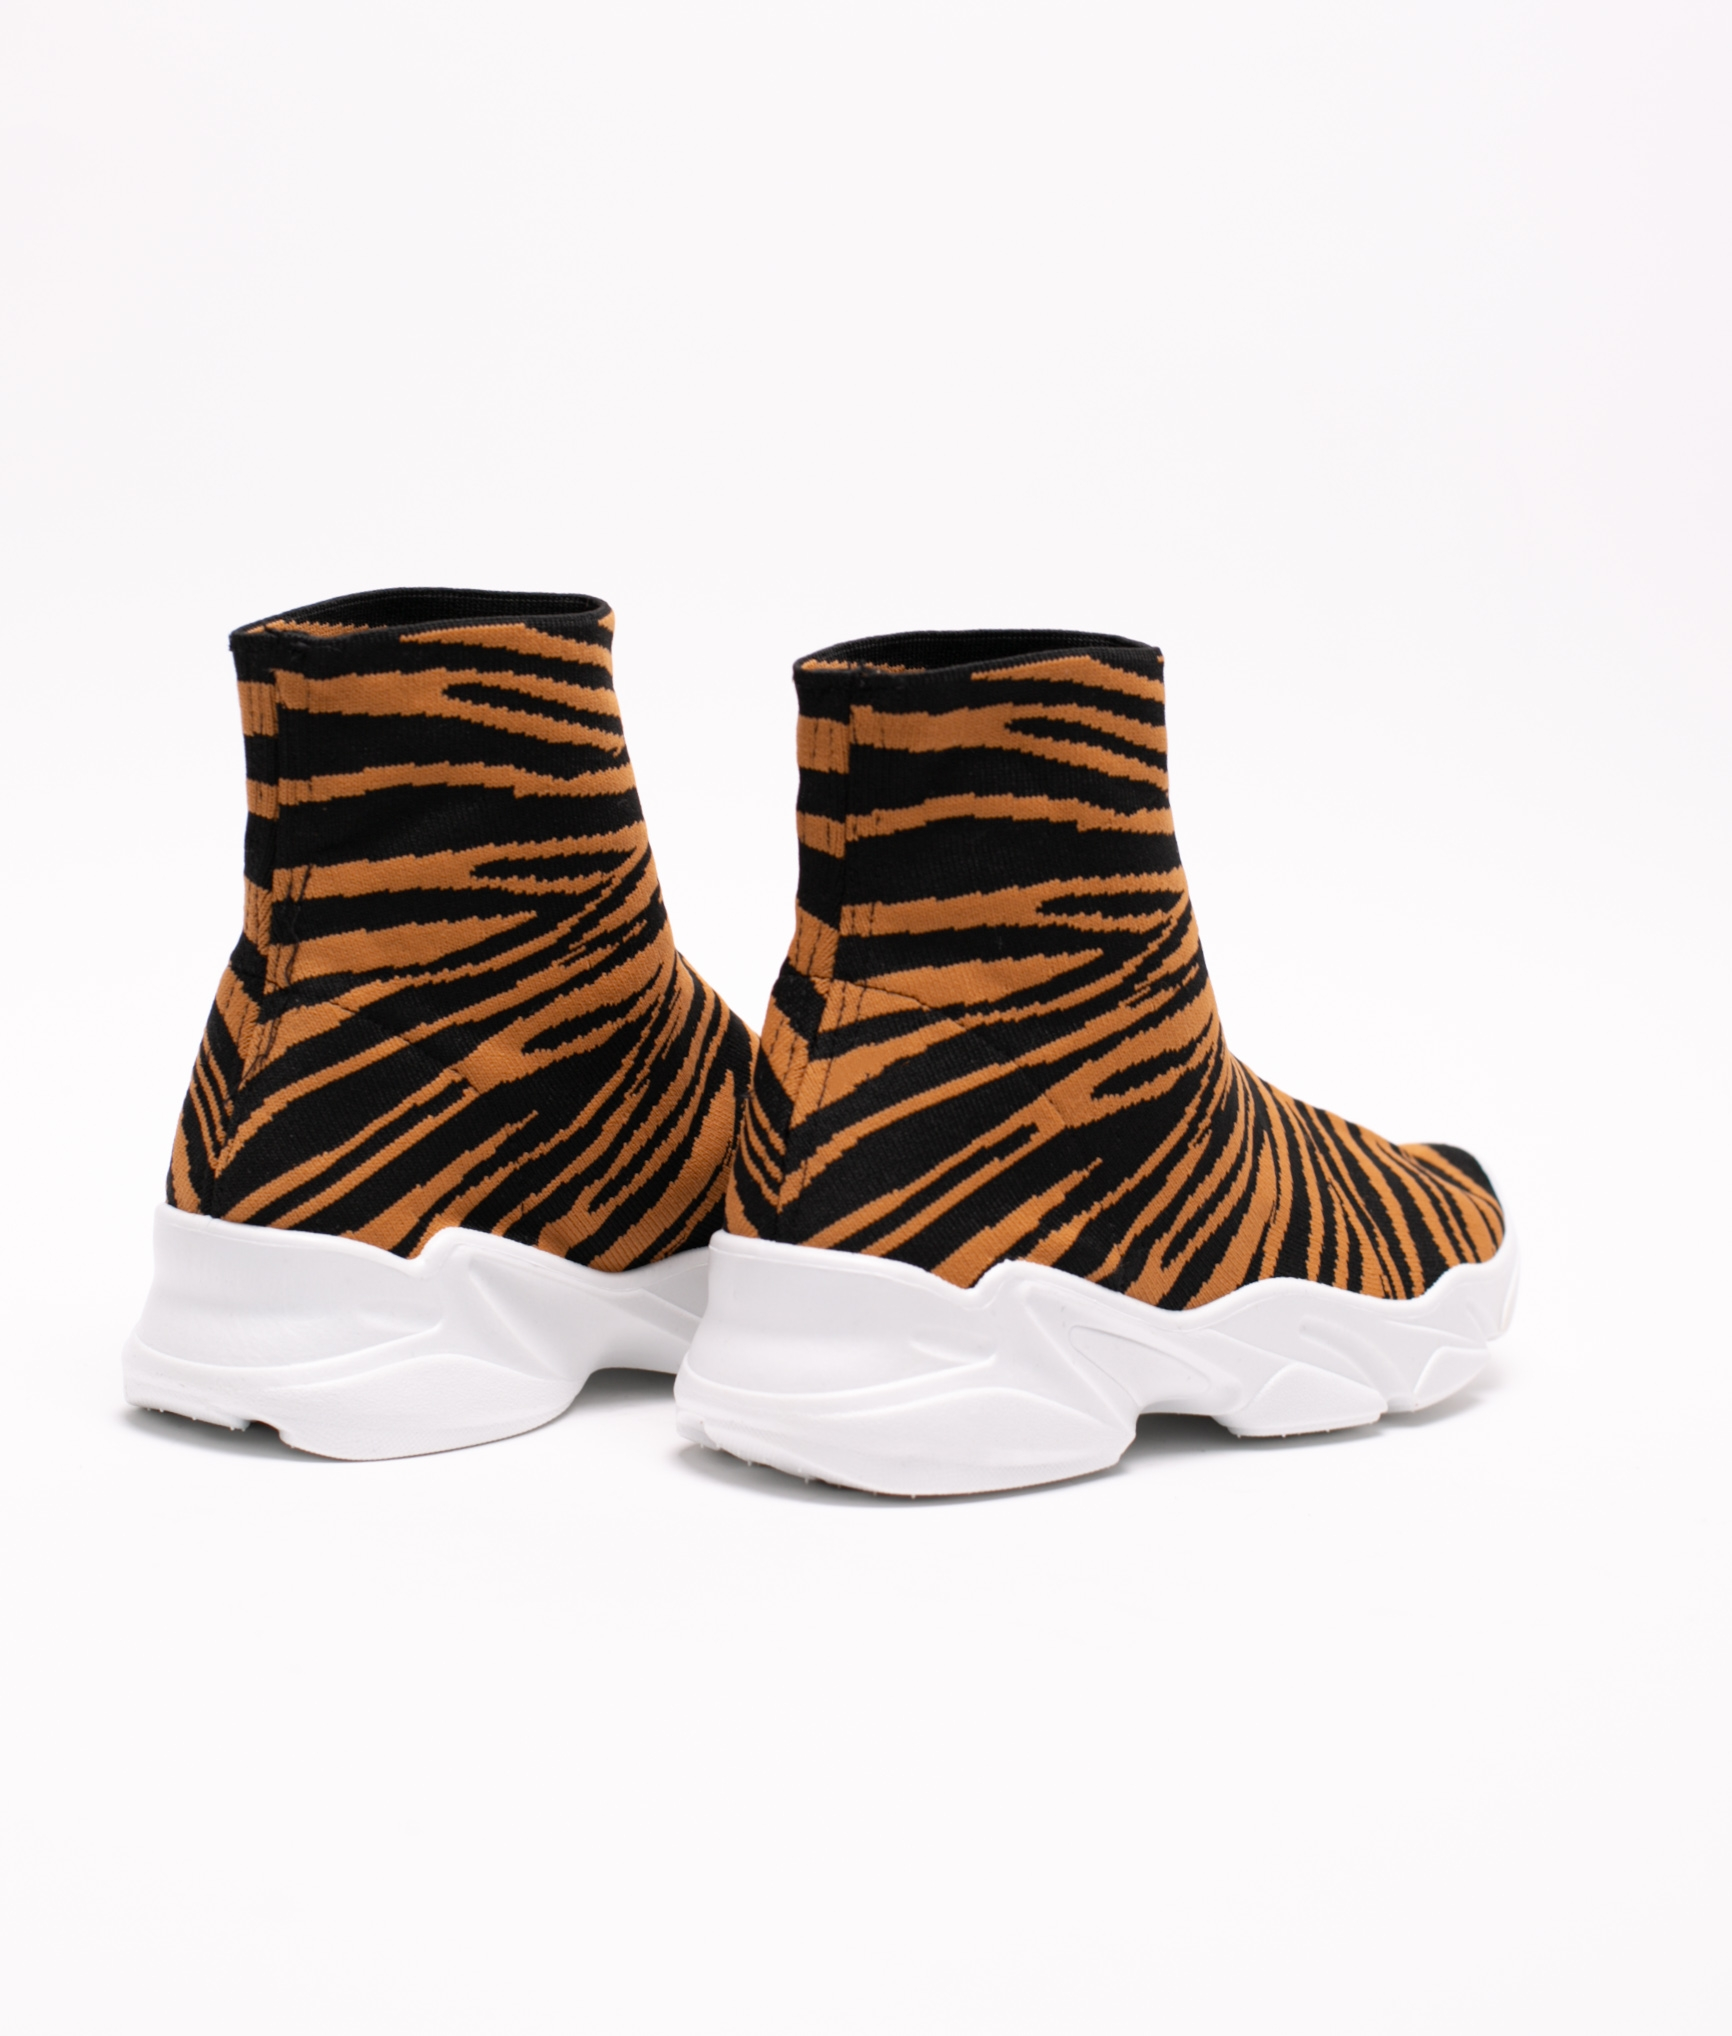 Sneakers Landi - Camel